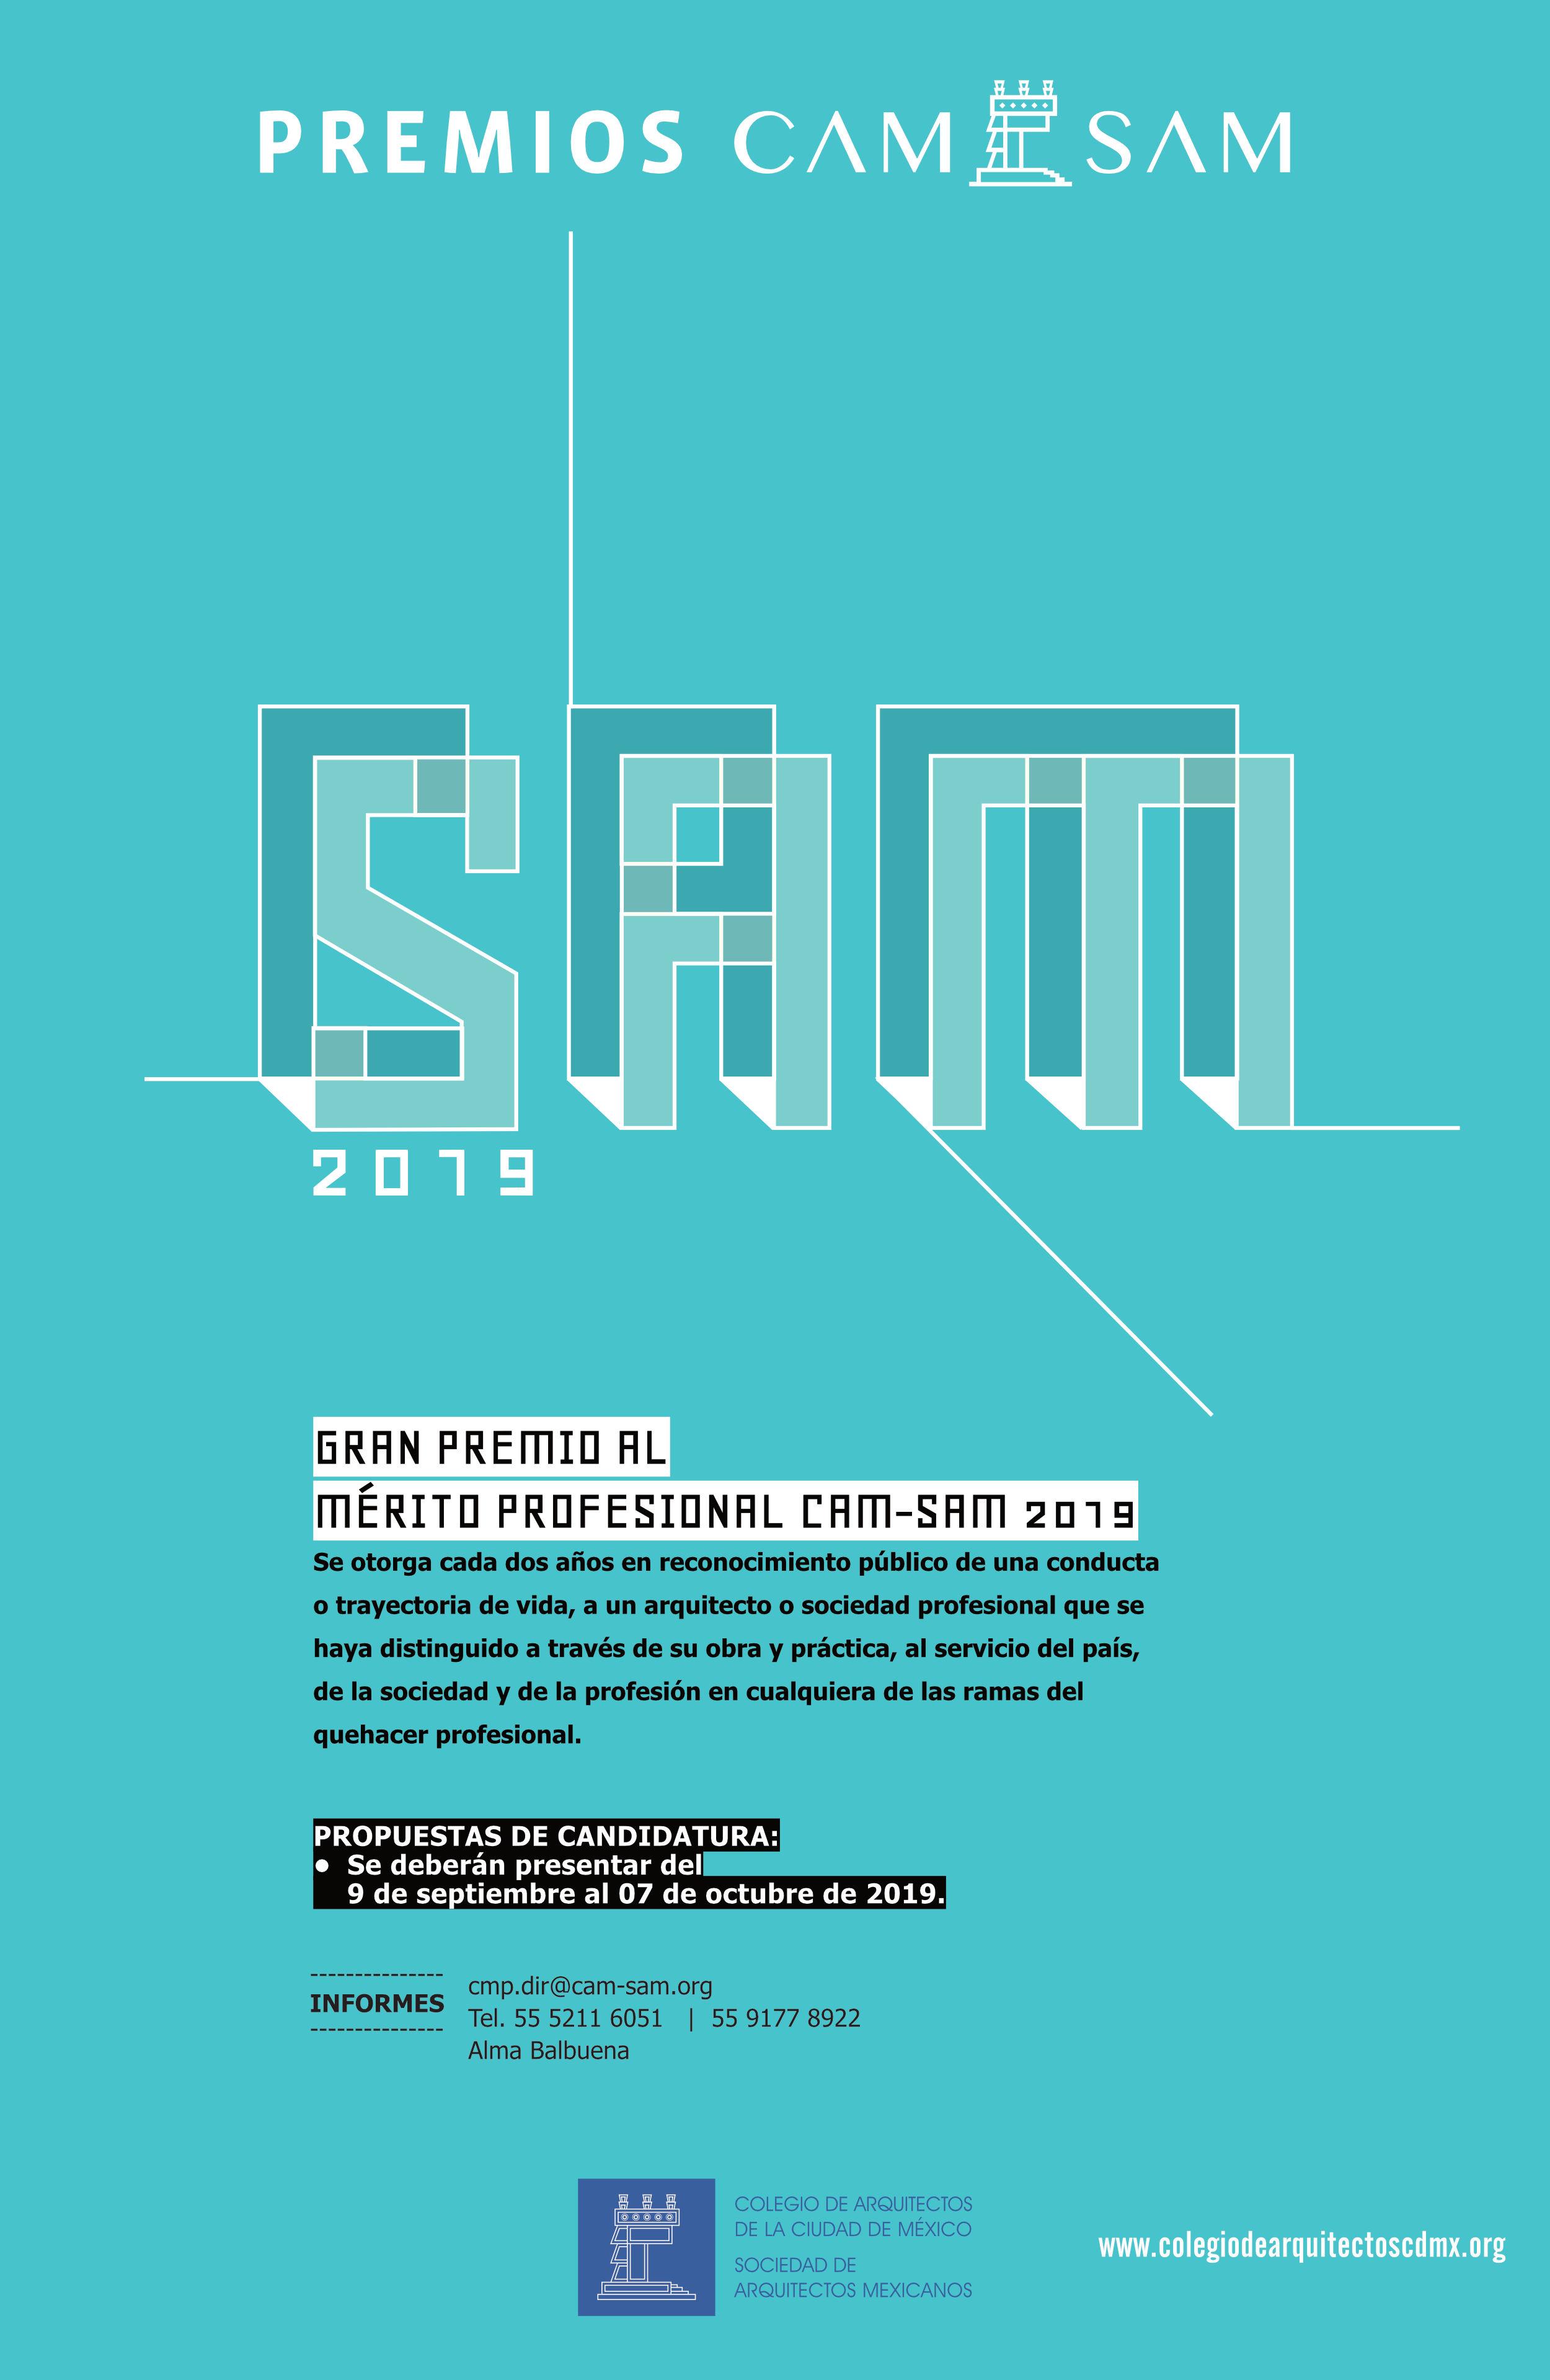 CAM SAM convoca al Gran Premio de Mérito Profesional 2019